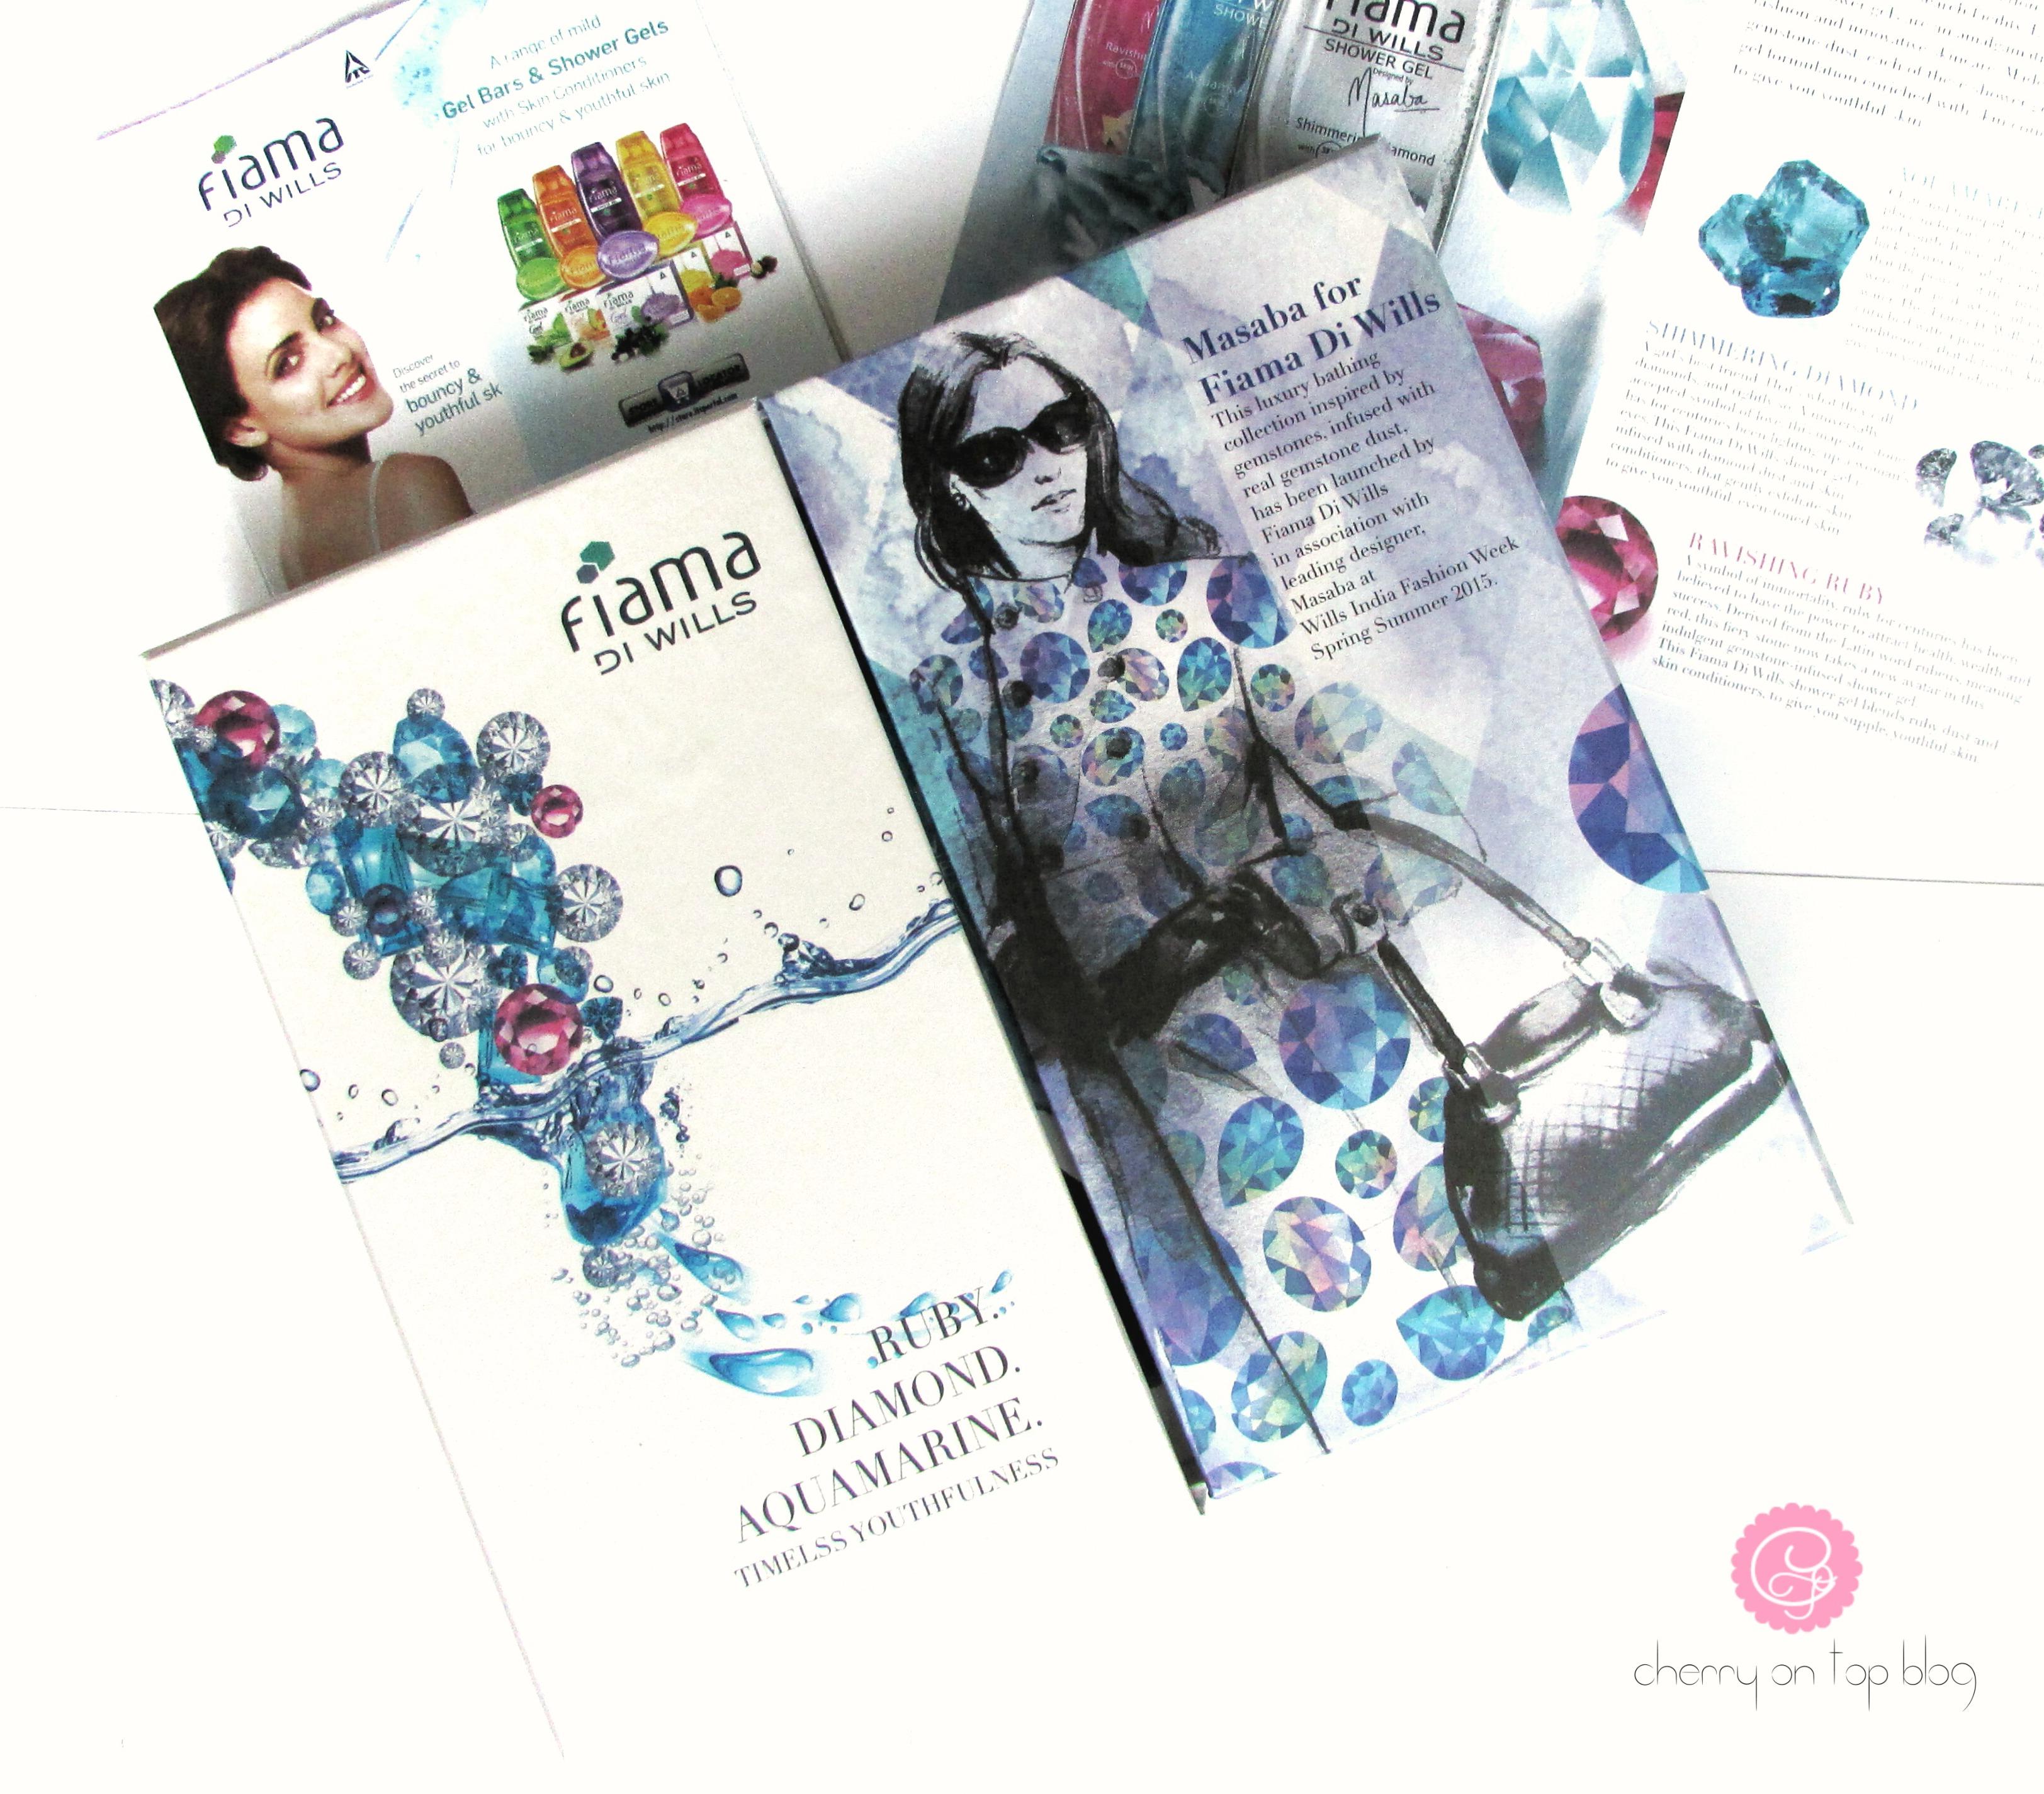 Fiama Di Wills Shower Jewels by Masaba Gupta- Aquamarine Agleam Review| cherryontopblog.com